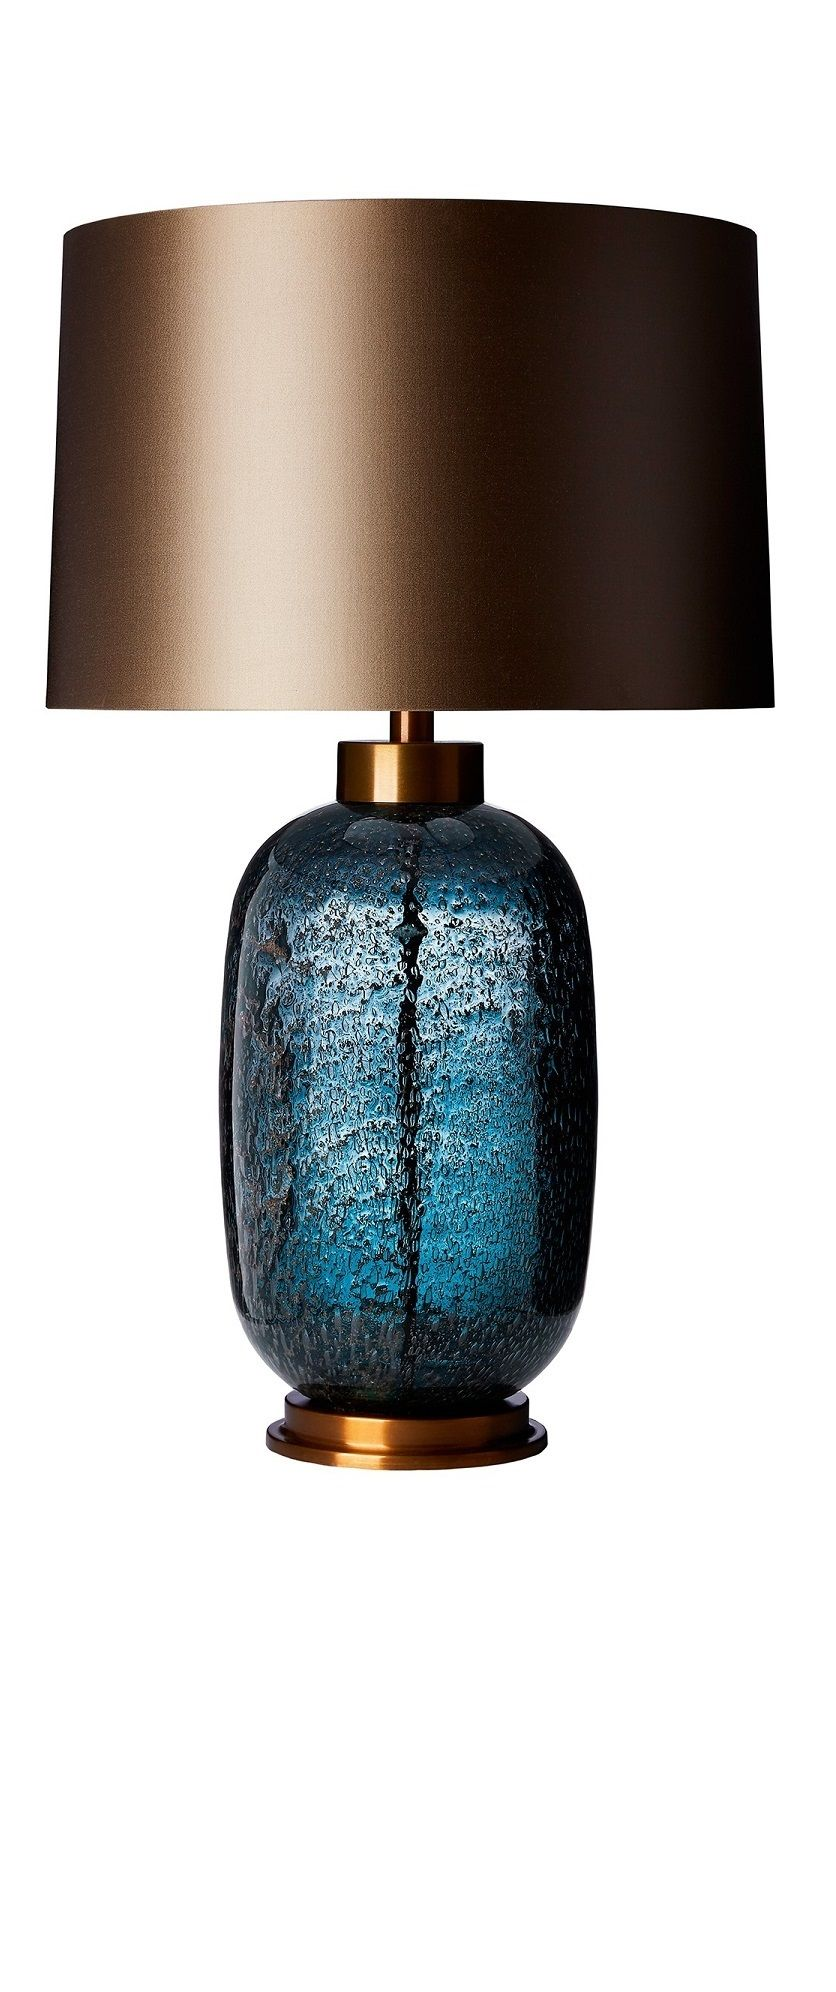 designer lamps for living room on luxury lamps luxury lamp designer lamp designer lamps lighting for hotels lighting for hotel hotel room luxury lamps table lamp luxury hotel light table lamp luxury